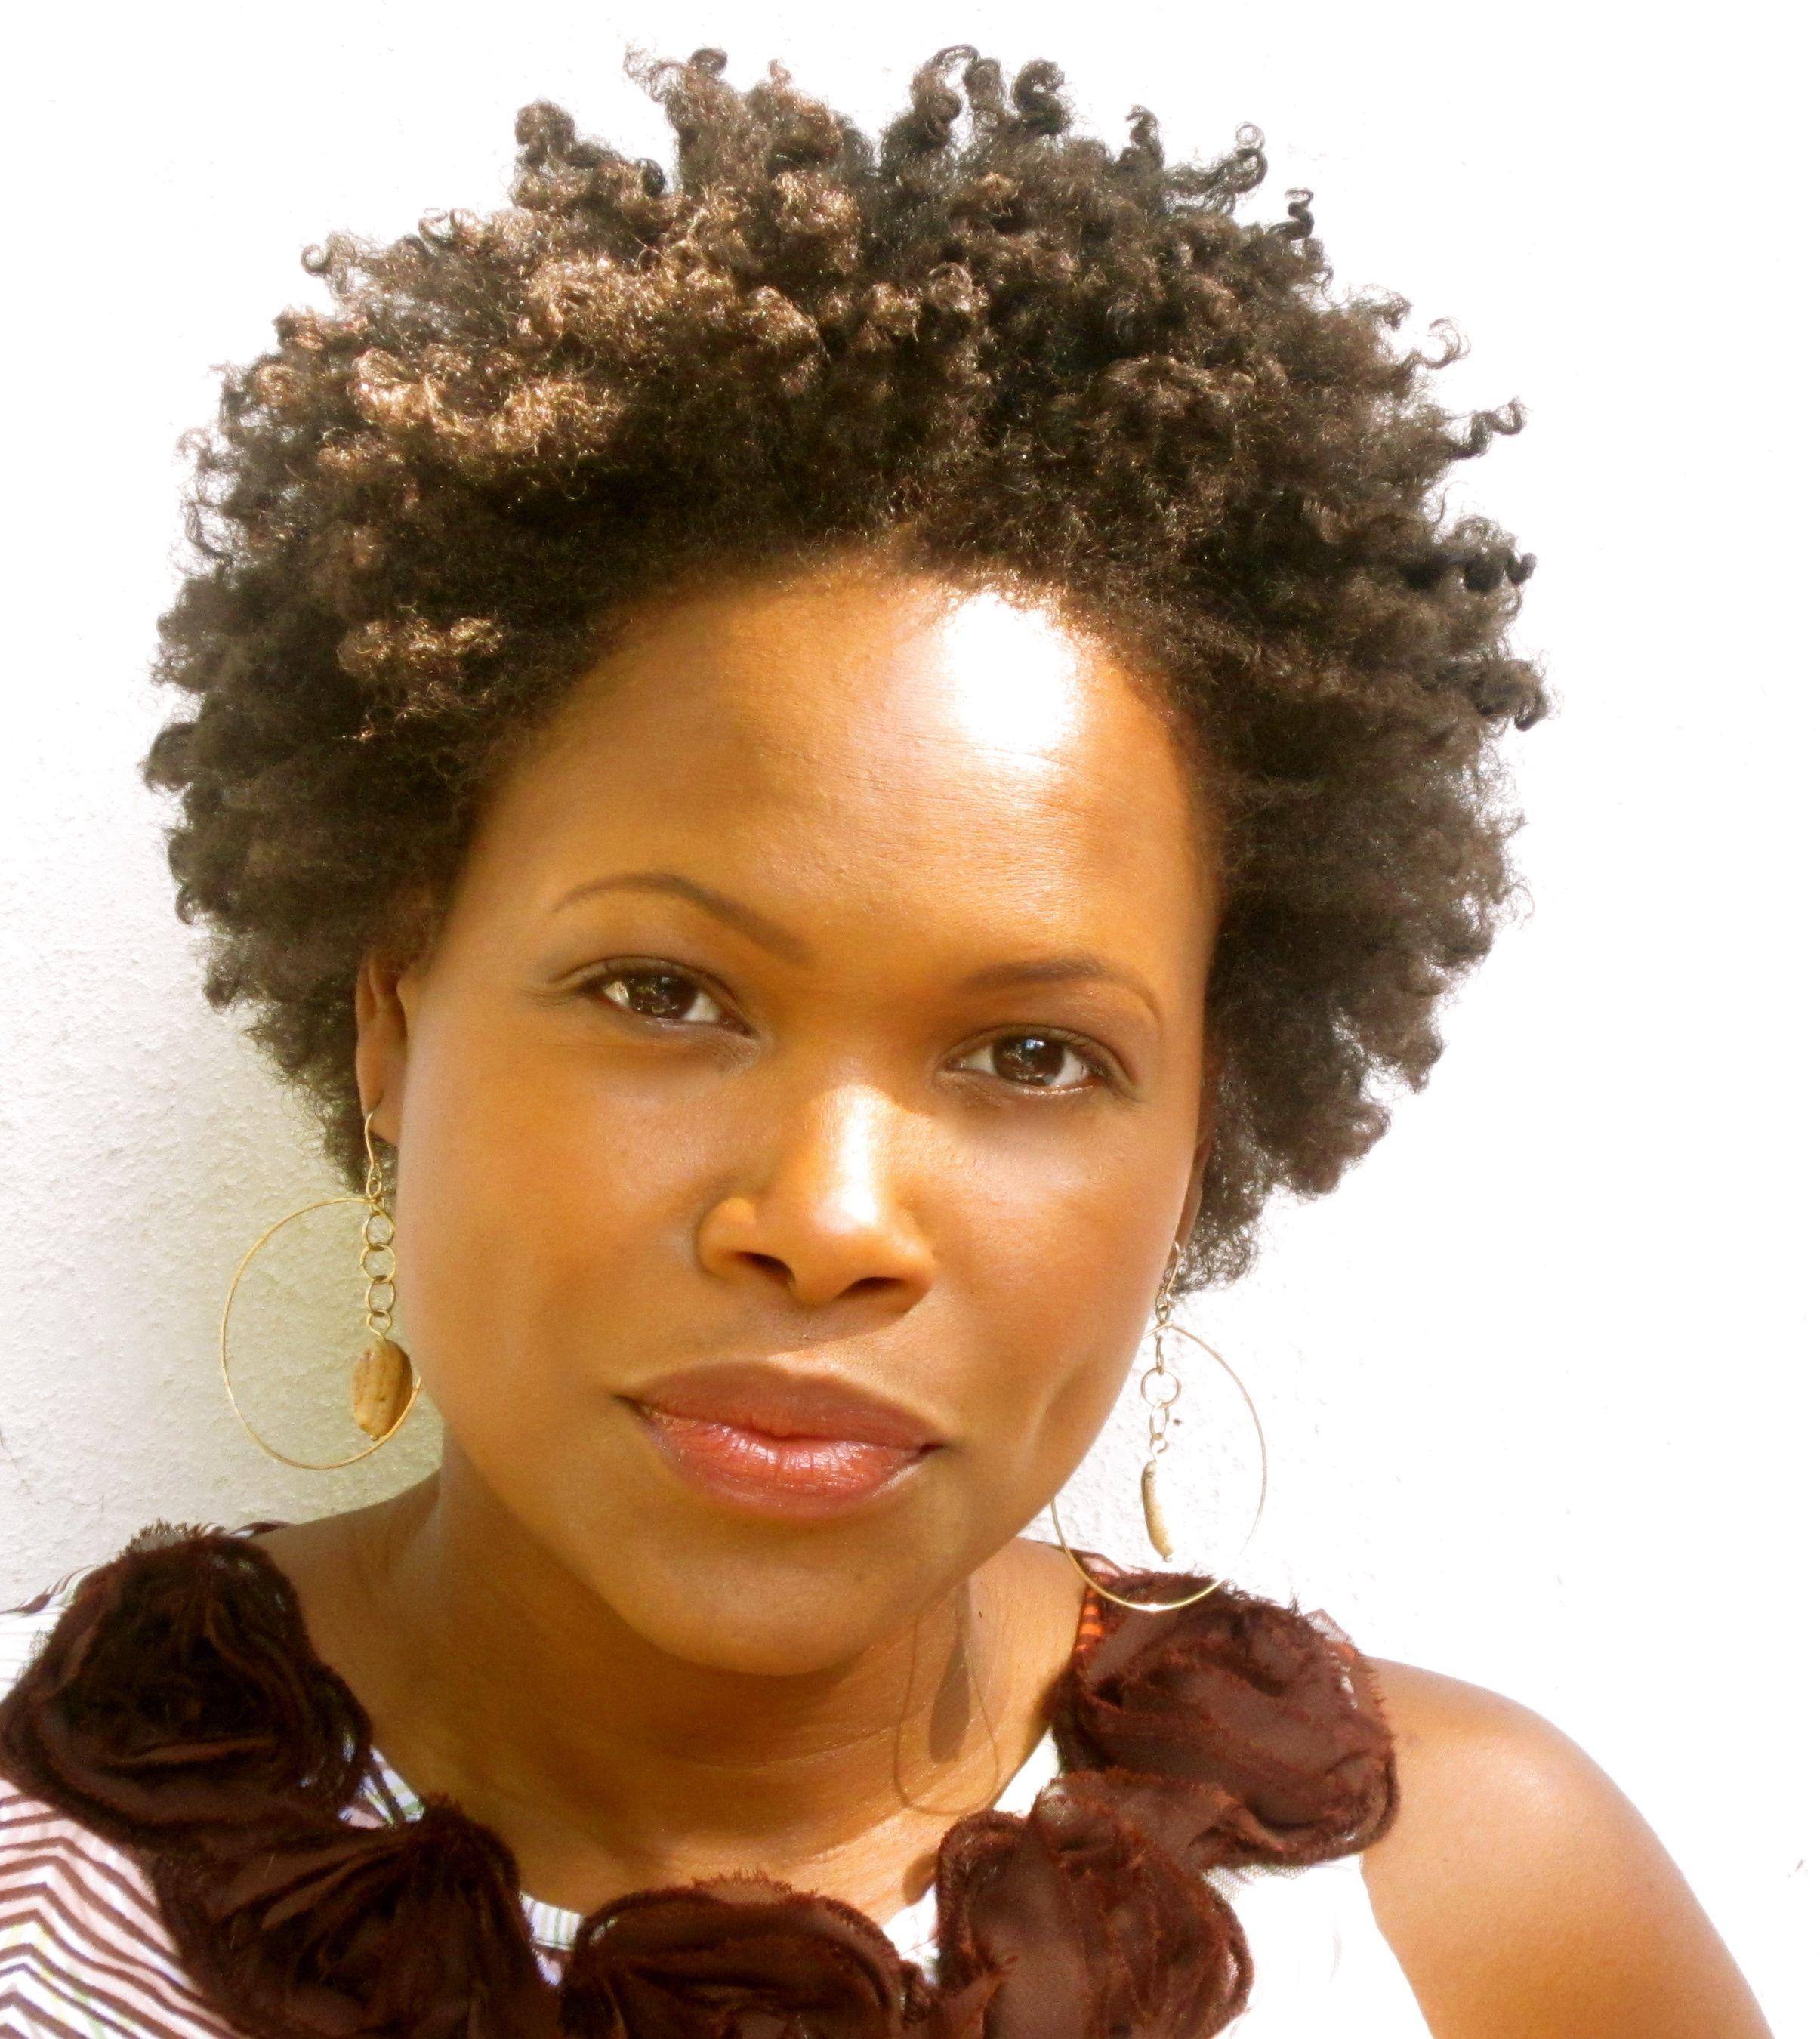 Astounding 1000 Images About Natural Hair On Pinterest Short Natural Short Hairstyles For Black Women Fulllsitofus